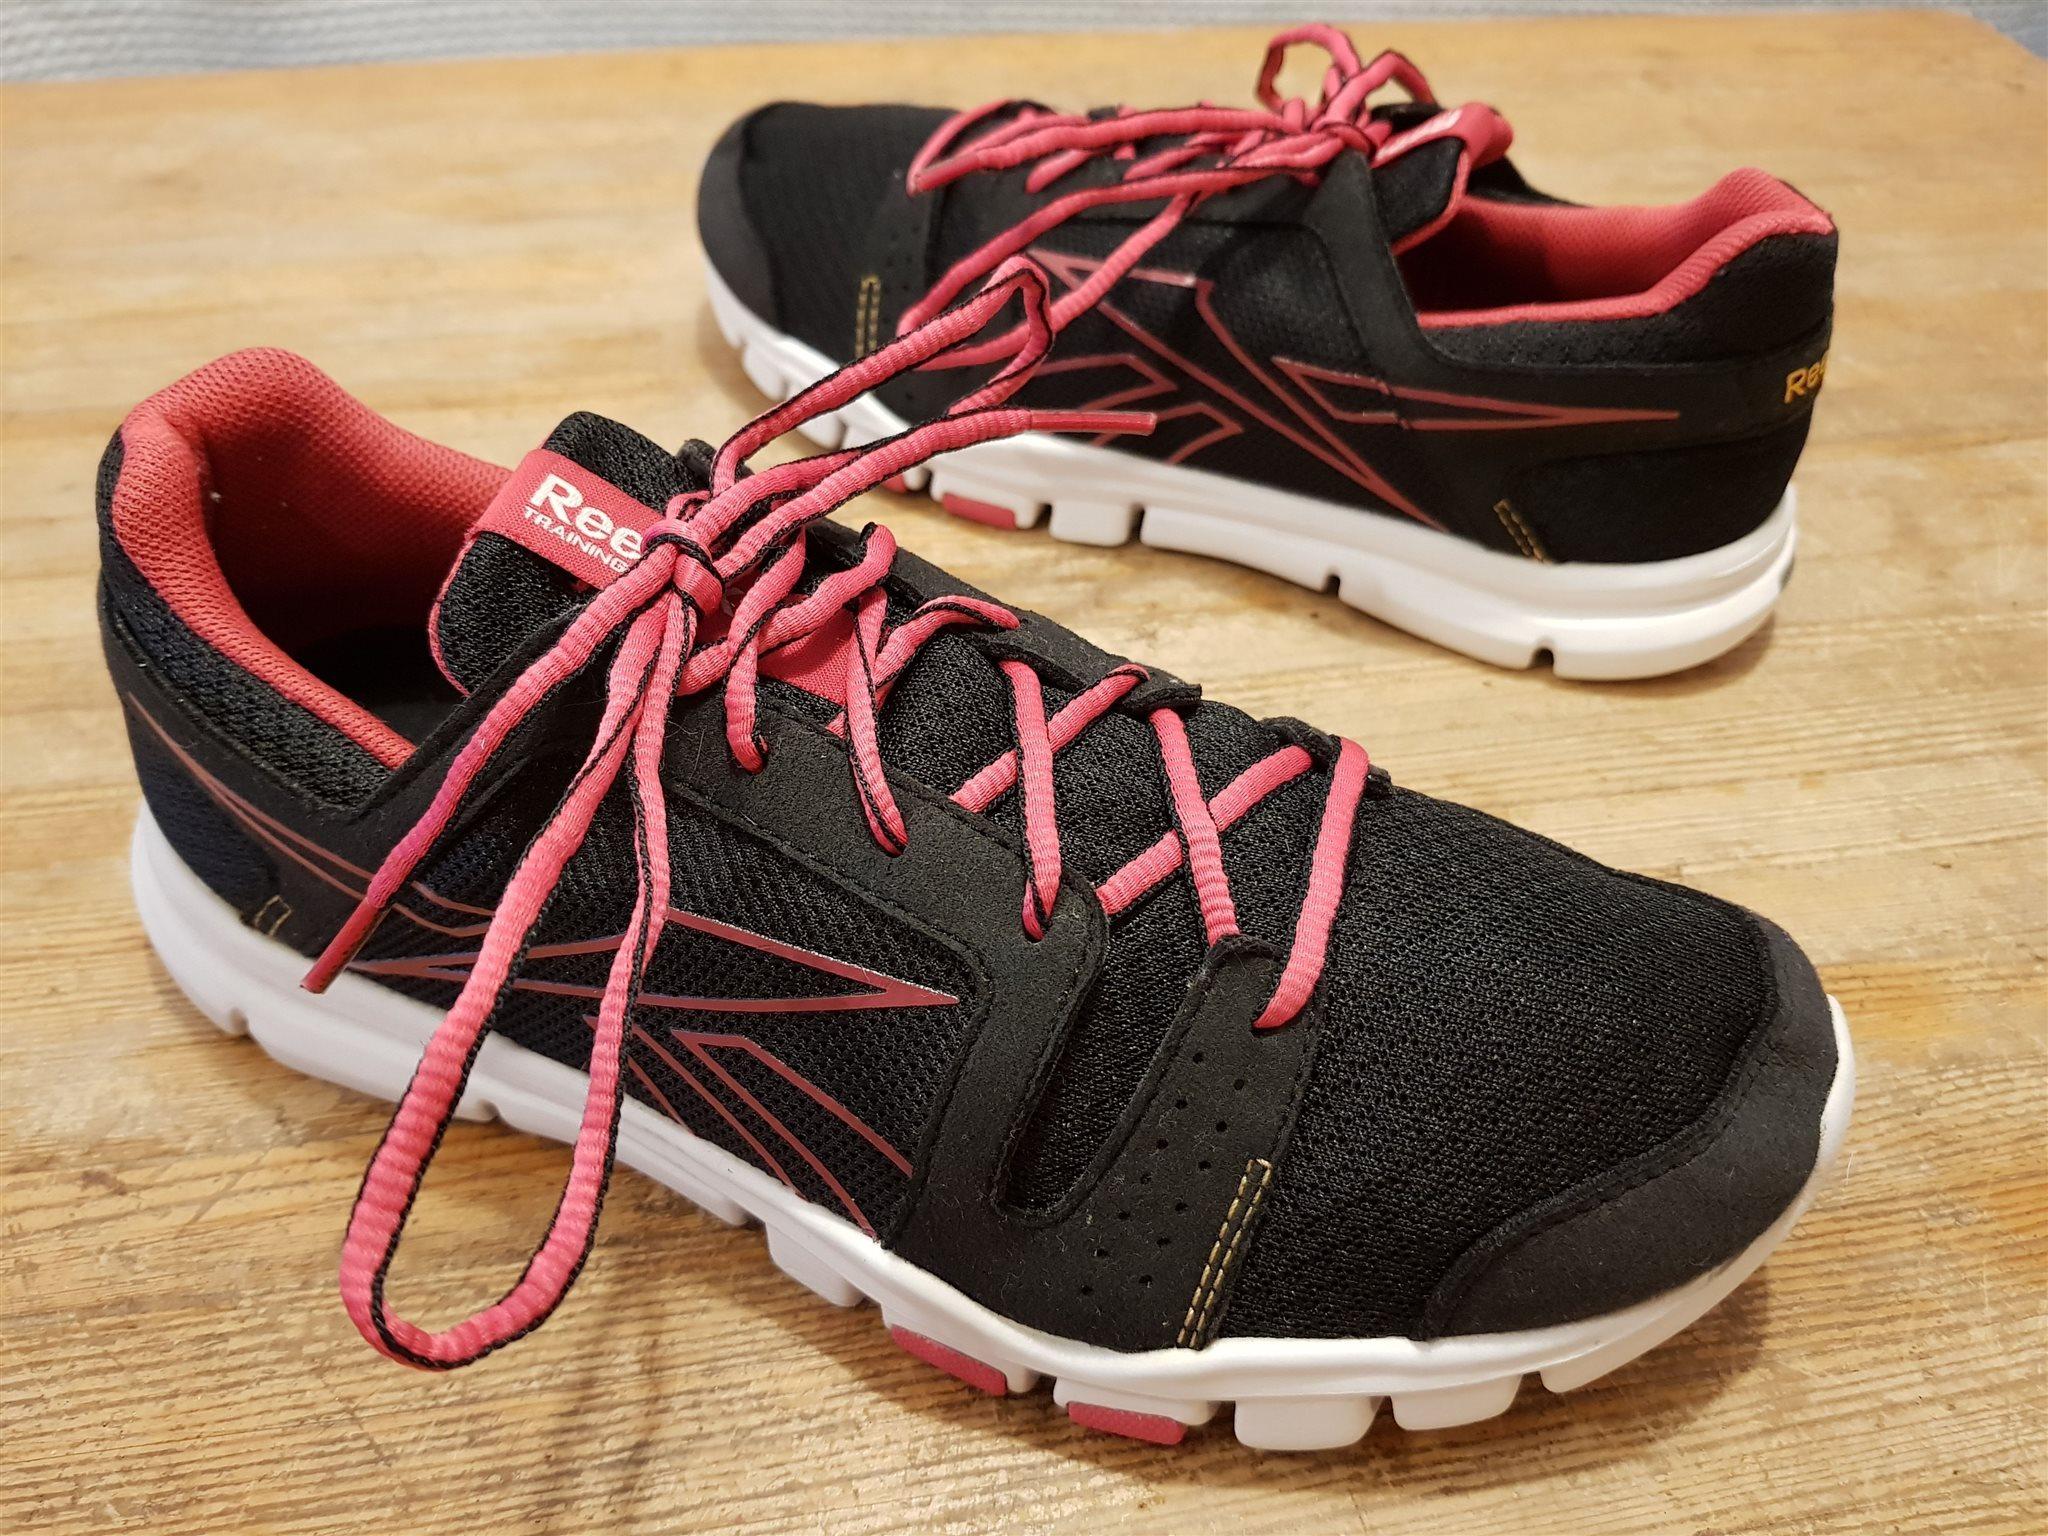 best loved 0dace 67470 Löparskor Reebok Training Yourflex sneakers str 37,5 i jättefint skick